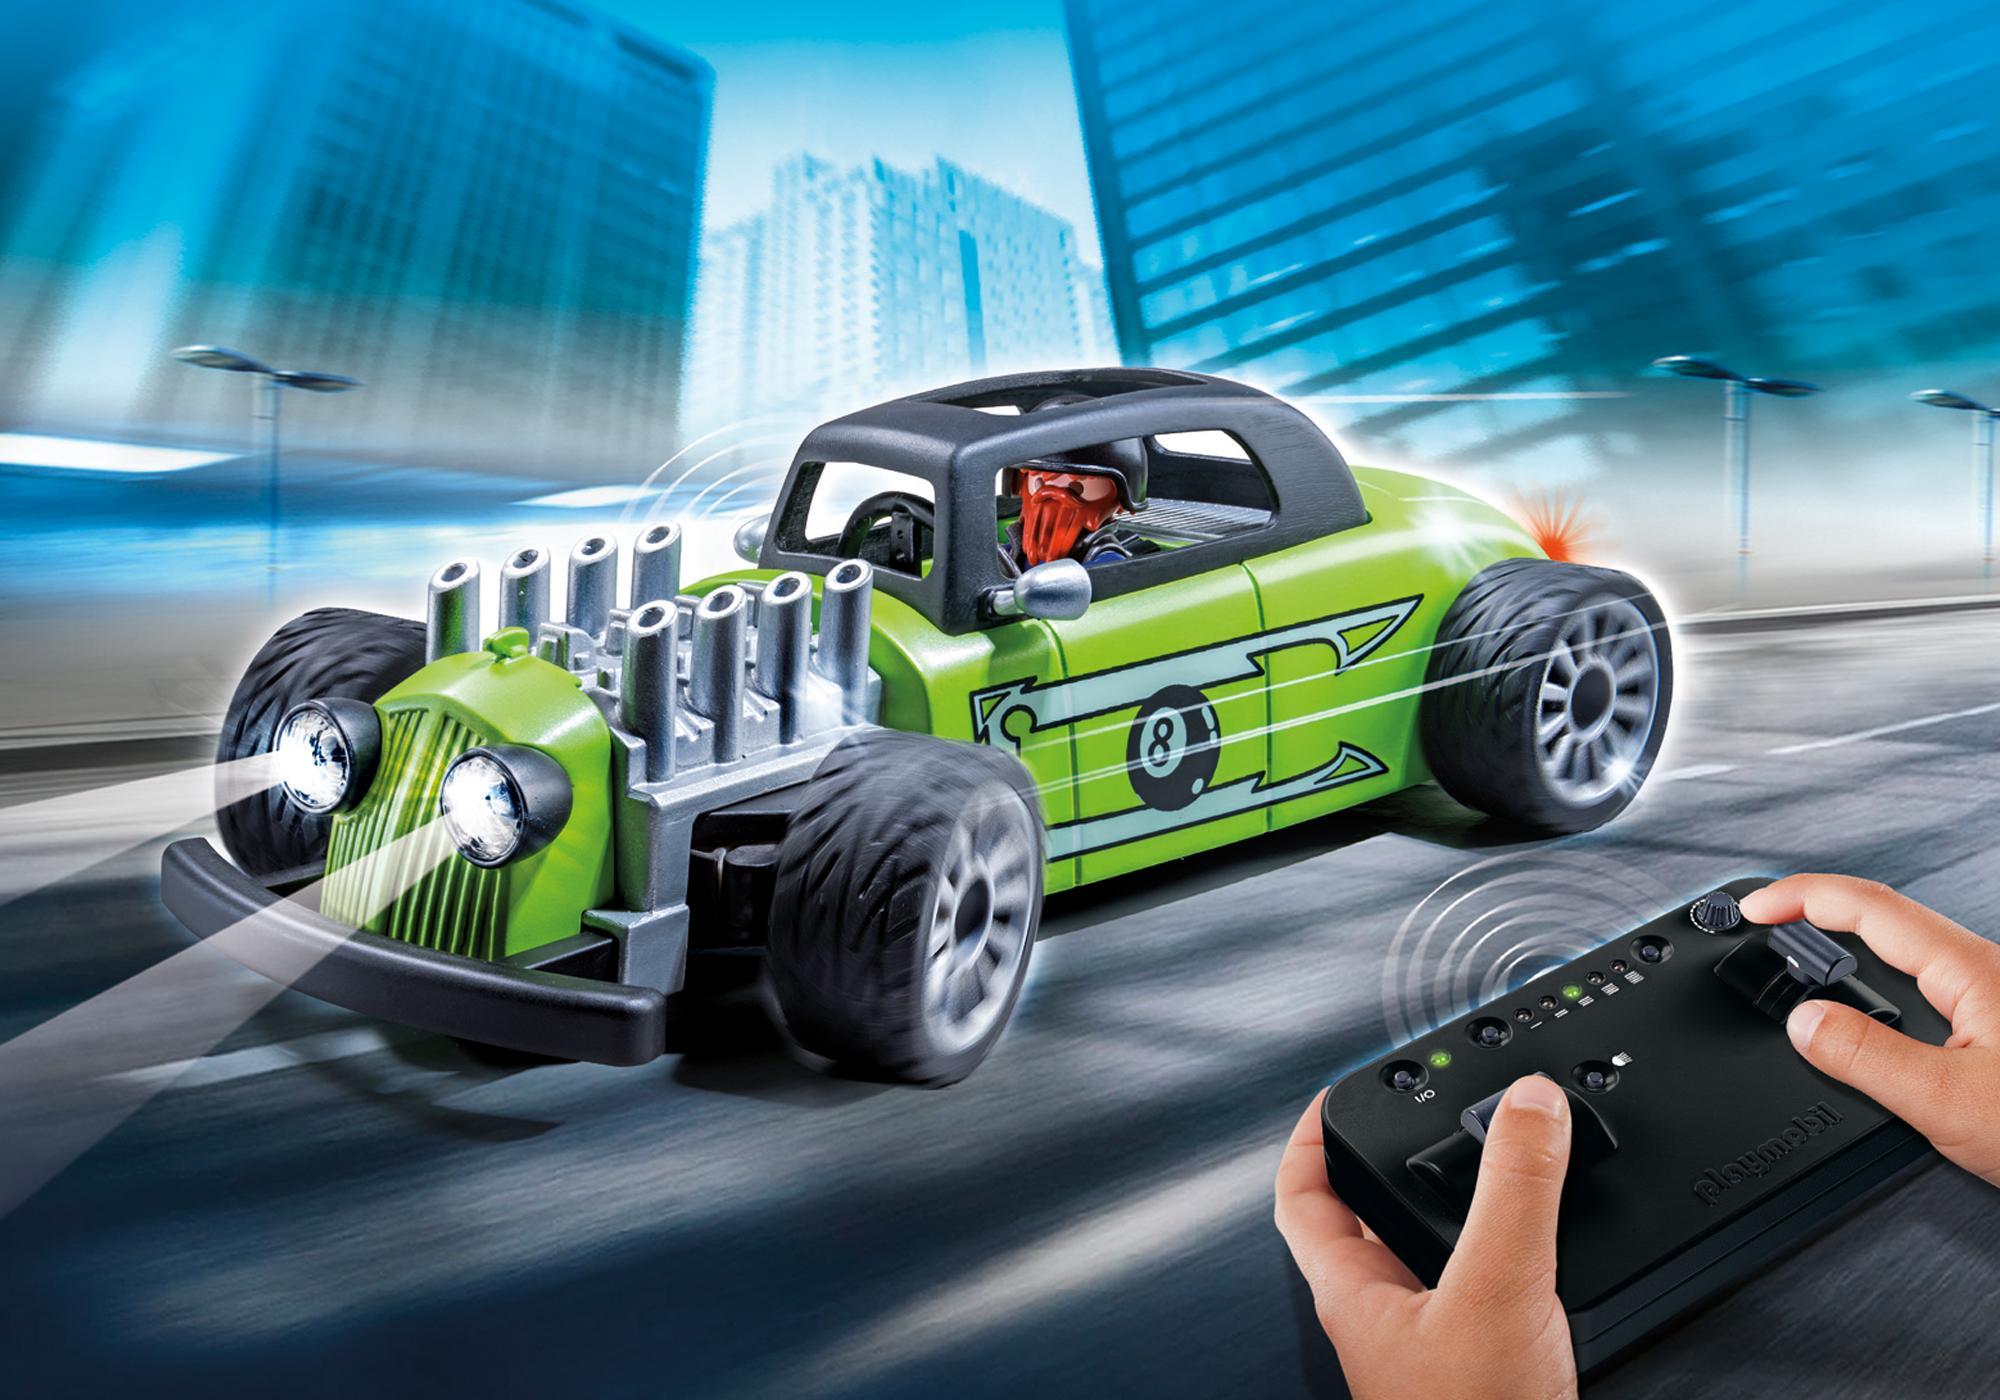 http://media.playmobil.com/i/playmobil/9091_product_detail/Racer Rock & Roll RC